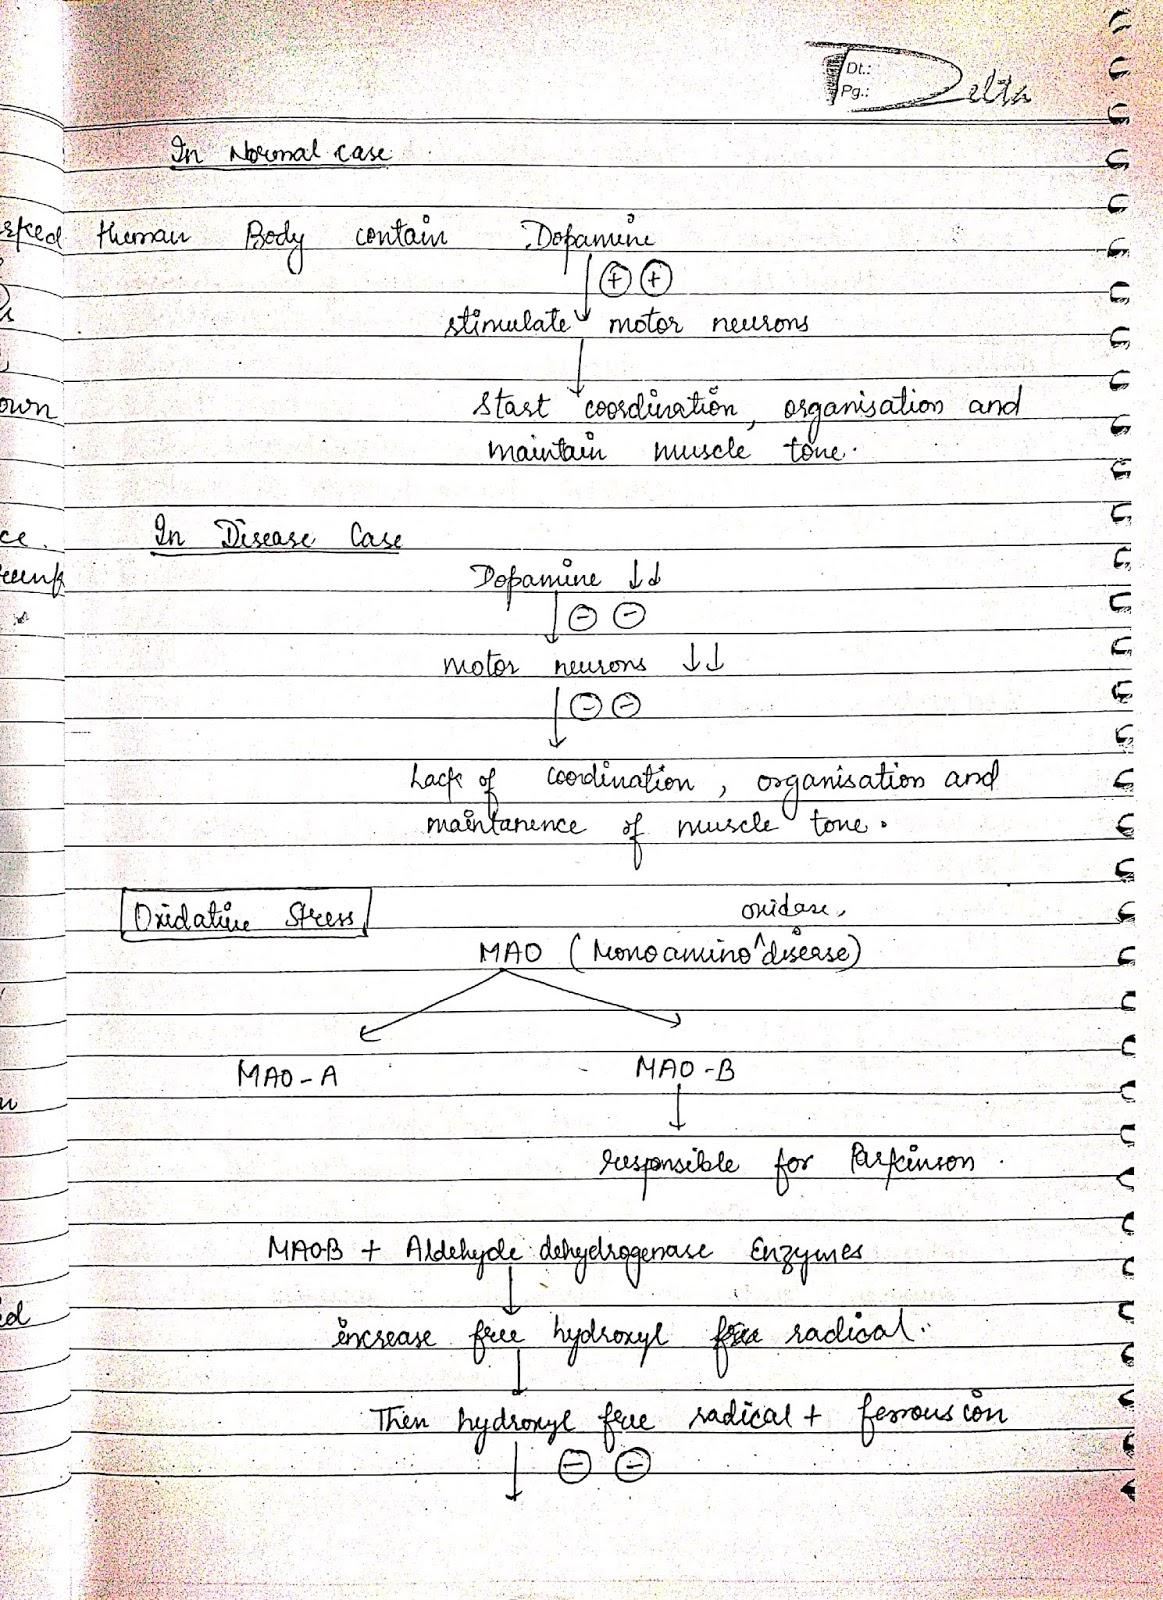 pathophysiology - nervous system disorder parkinson